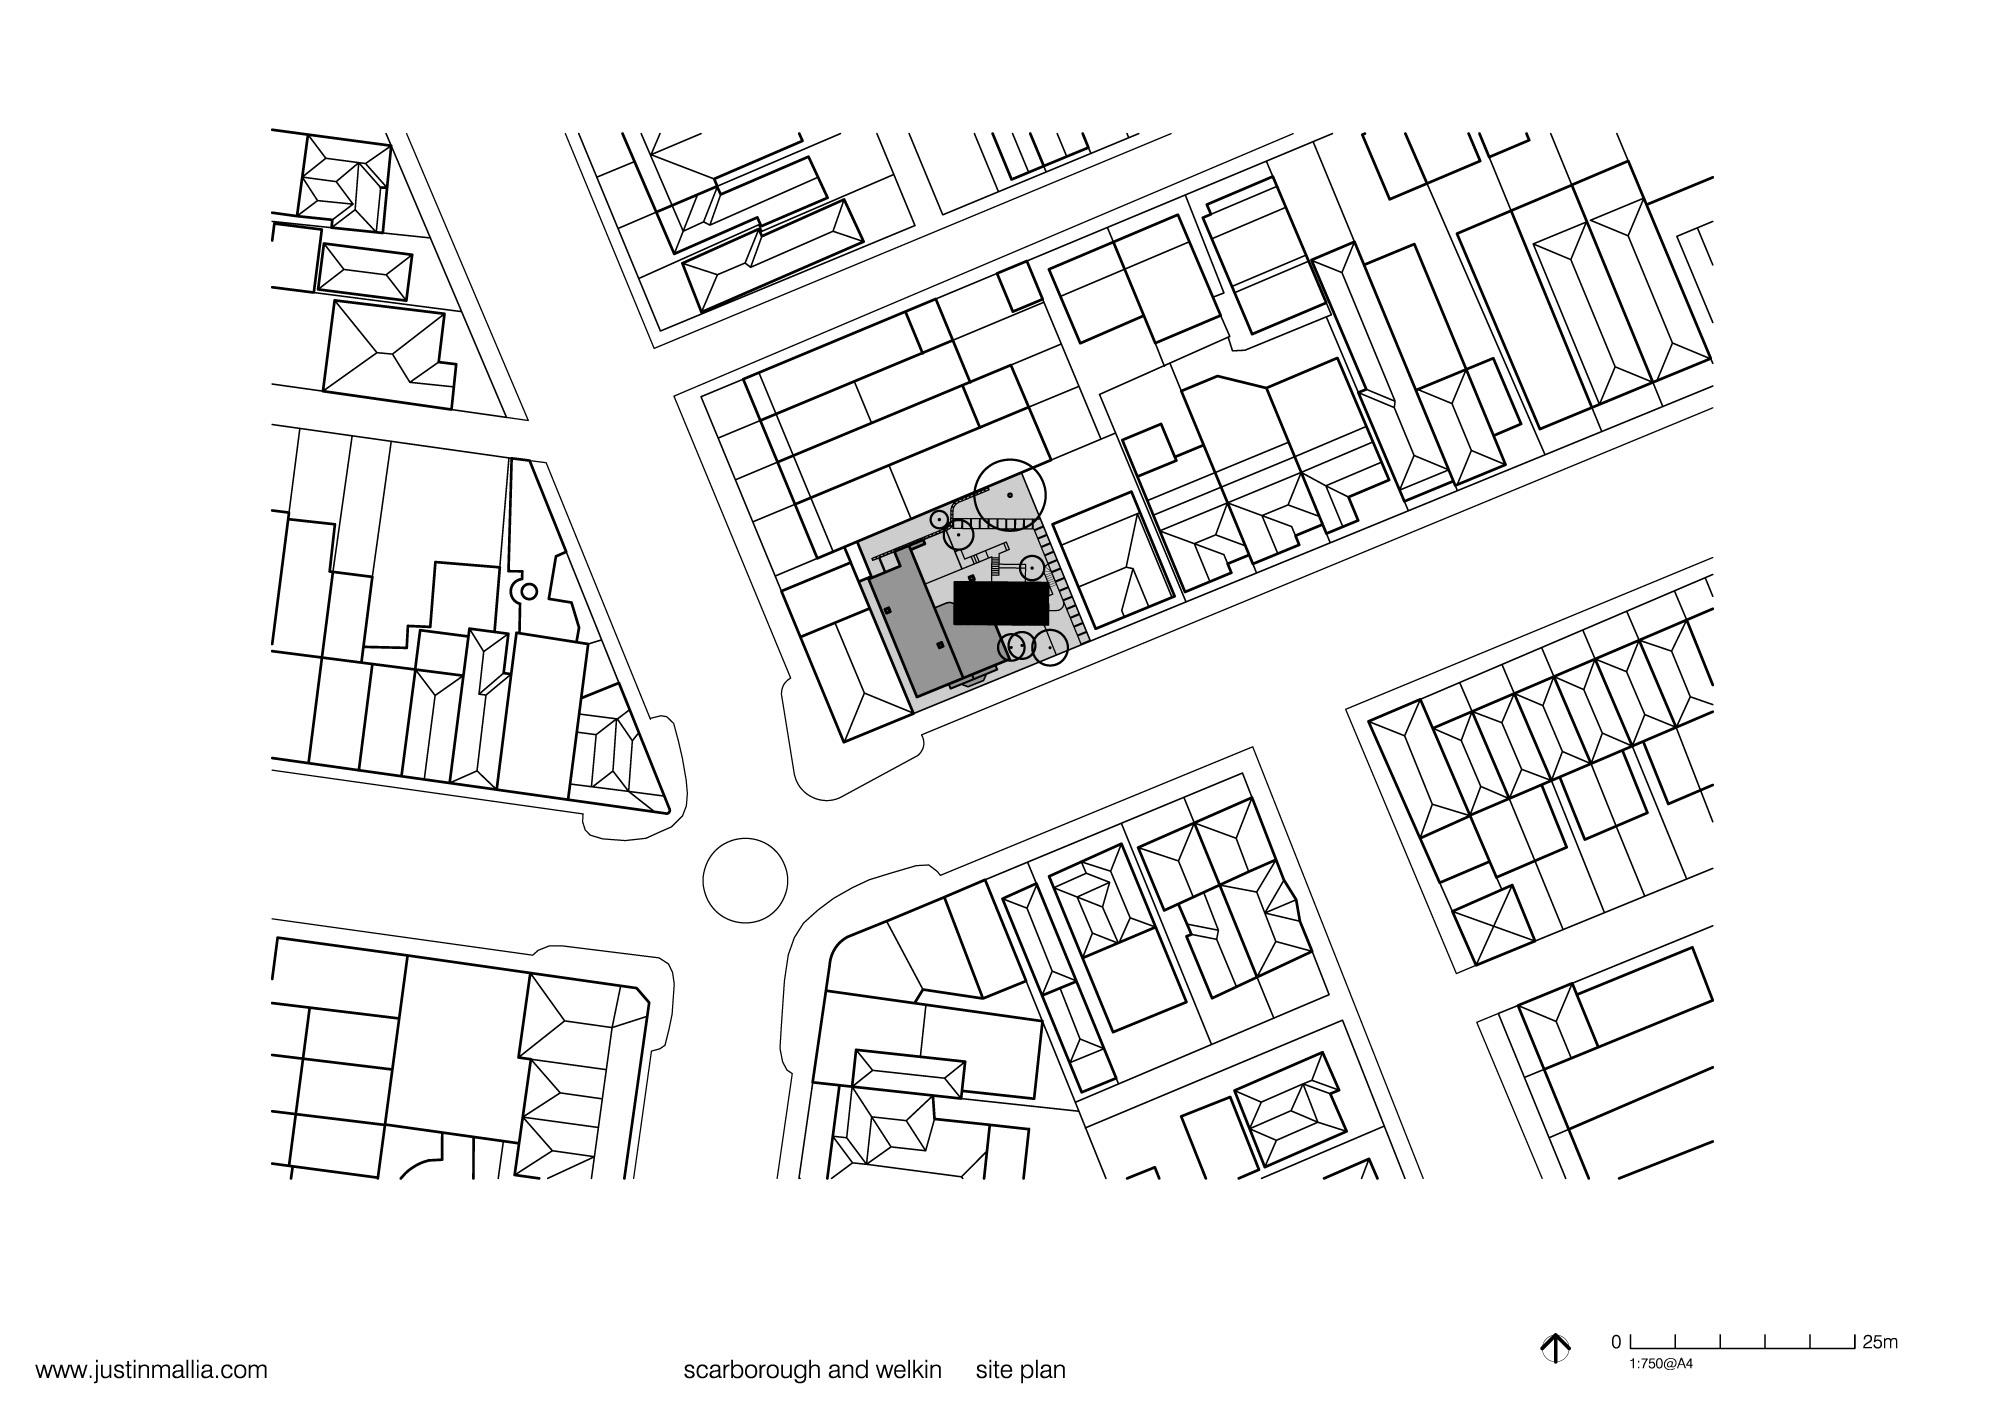 scarborough webpage site plan.jpg